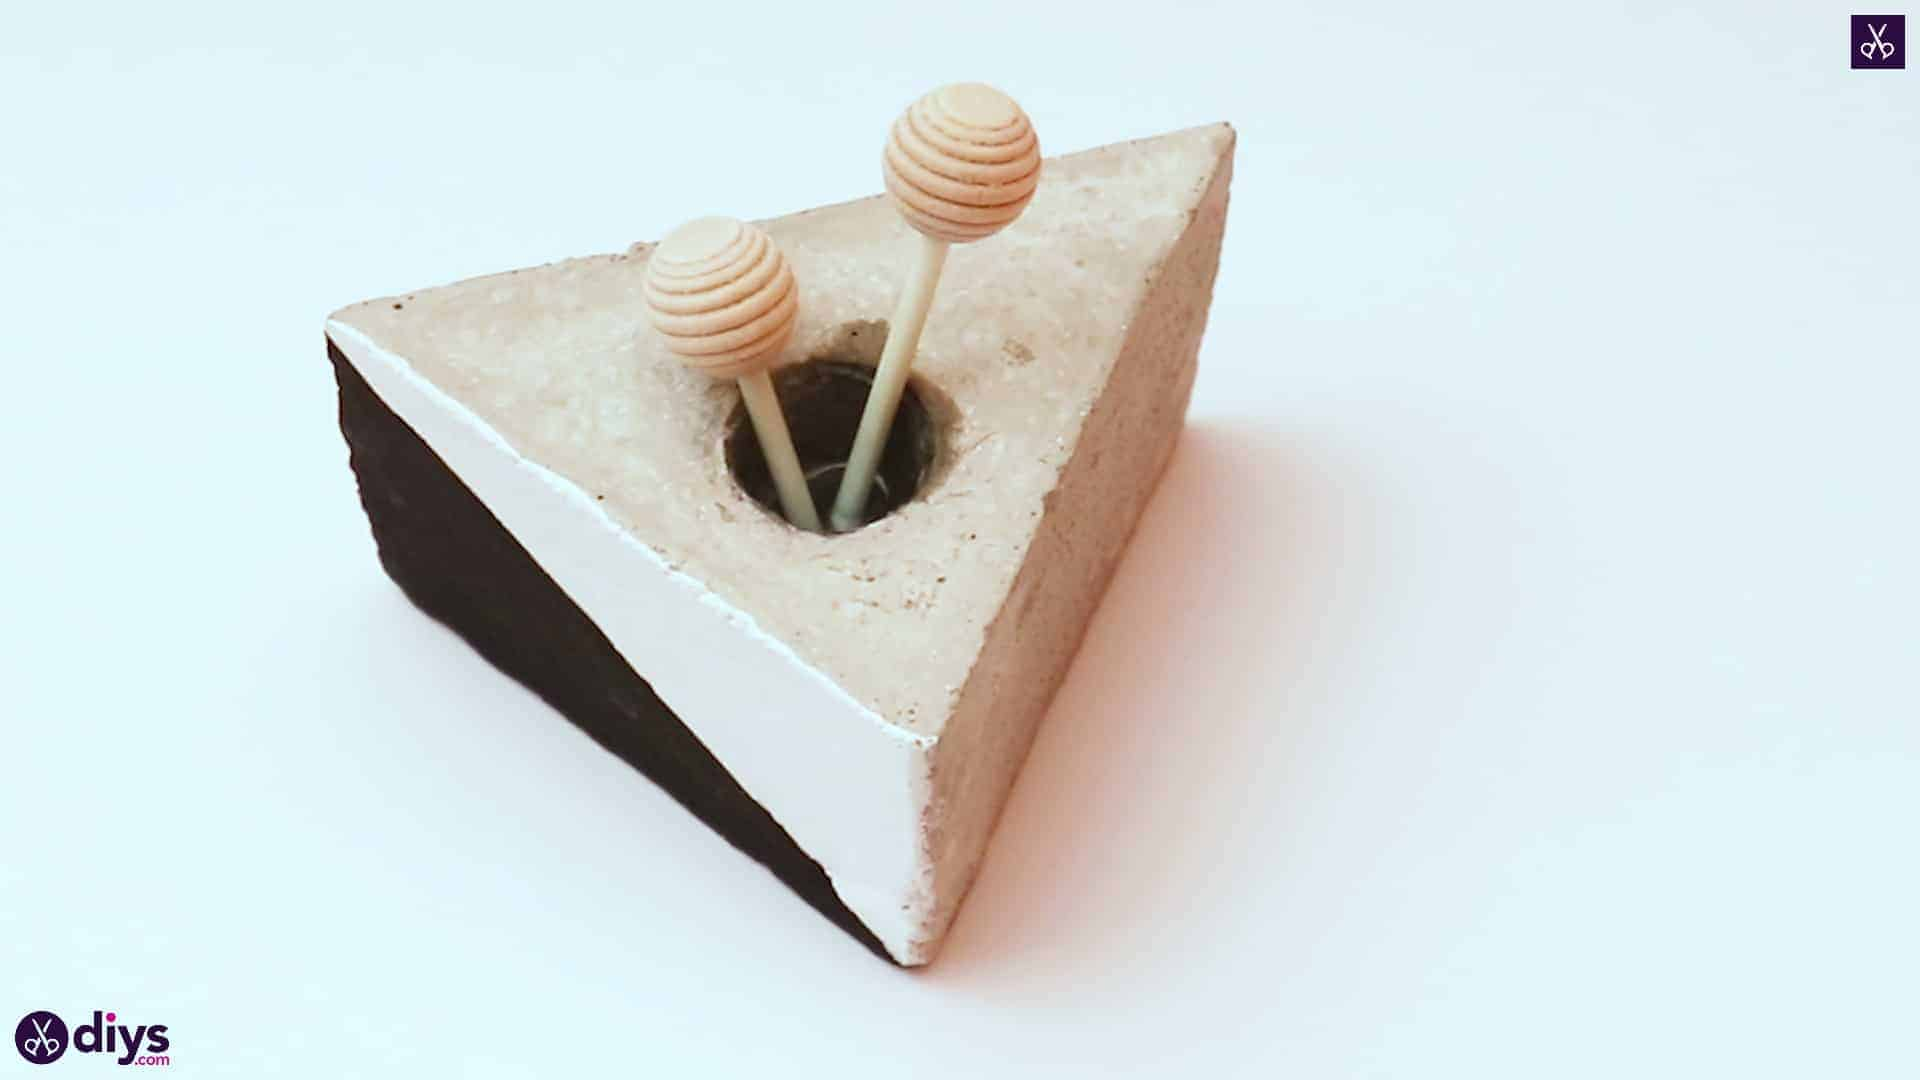 Diy concrete reed diffuser